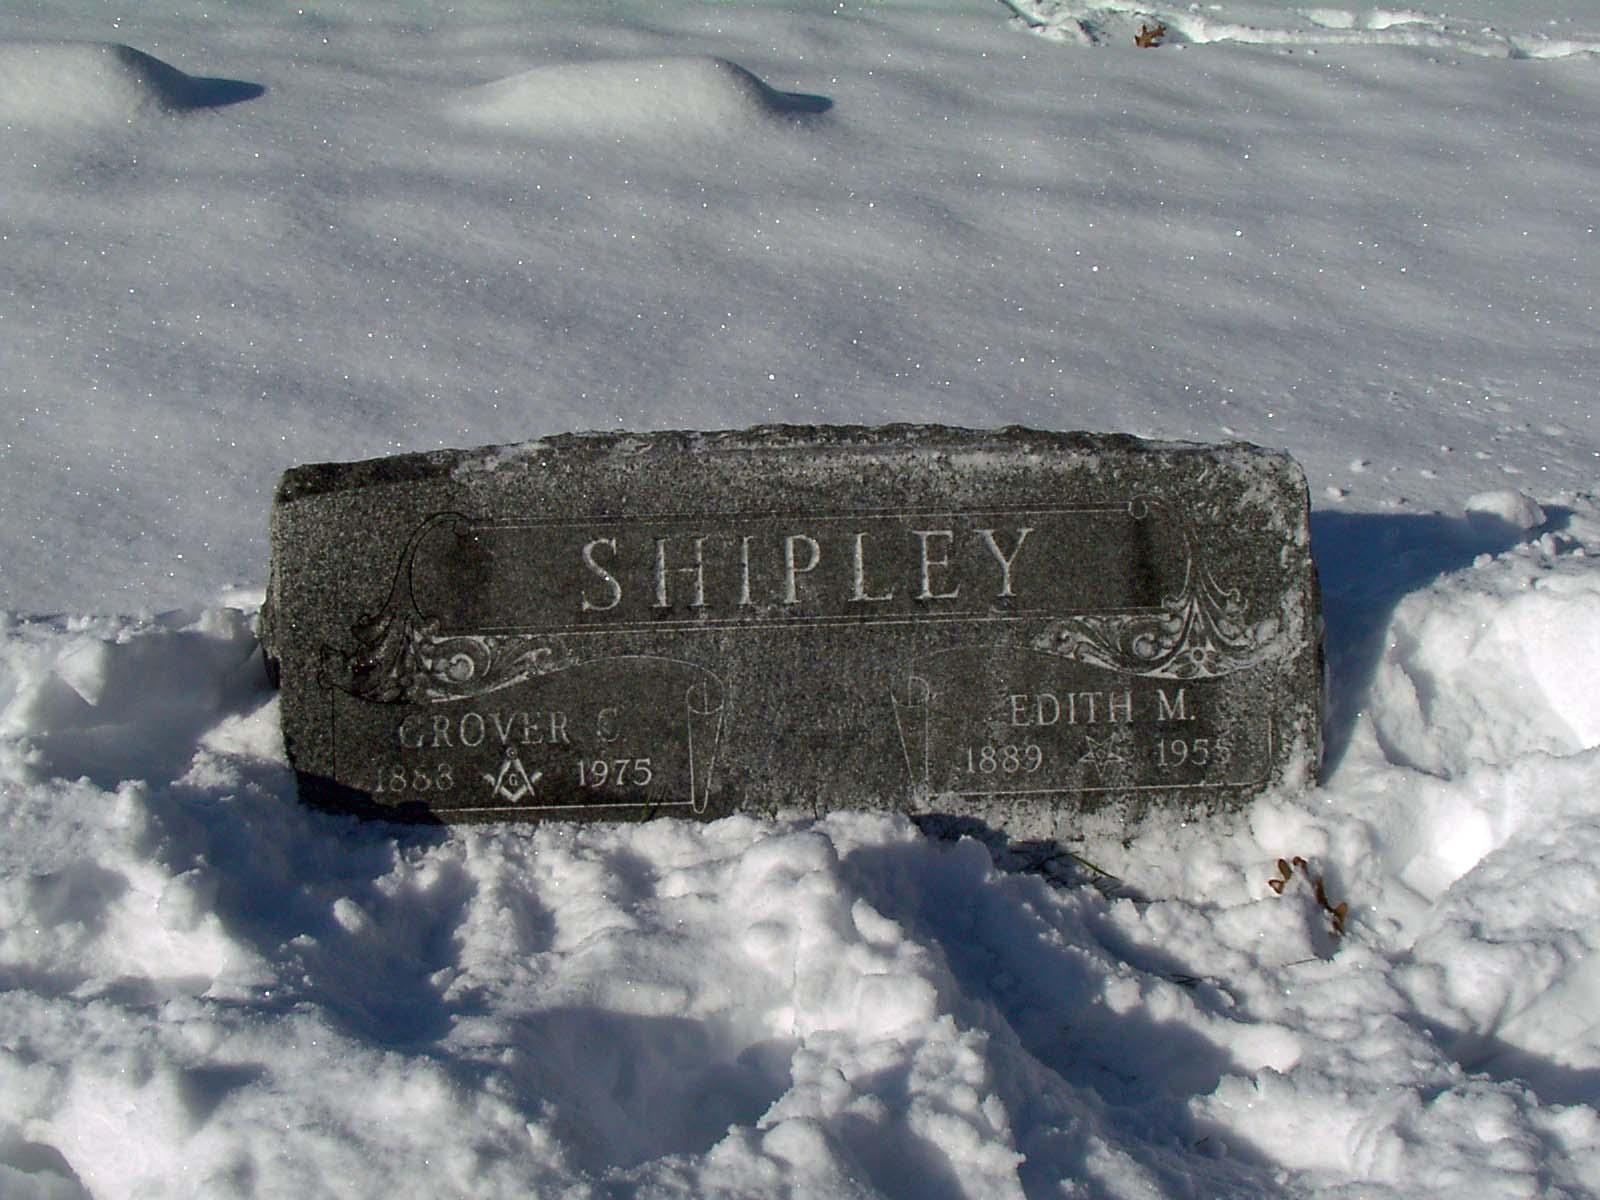 Grover Anderson Shipley